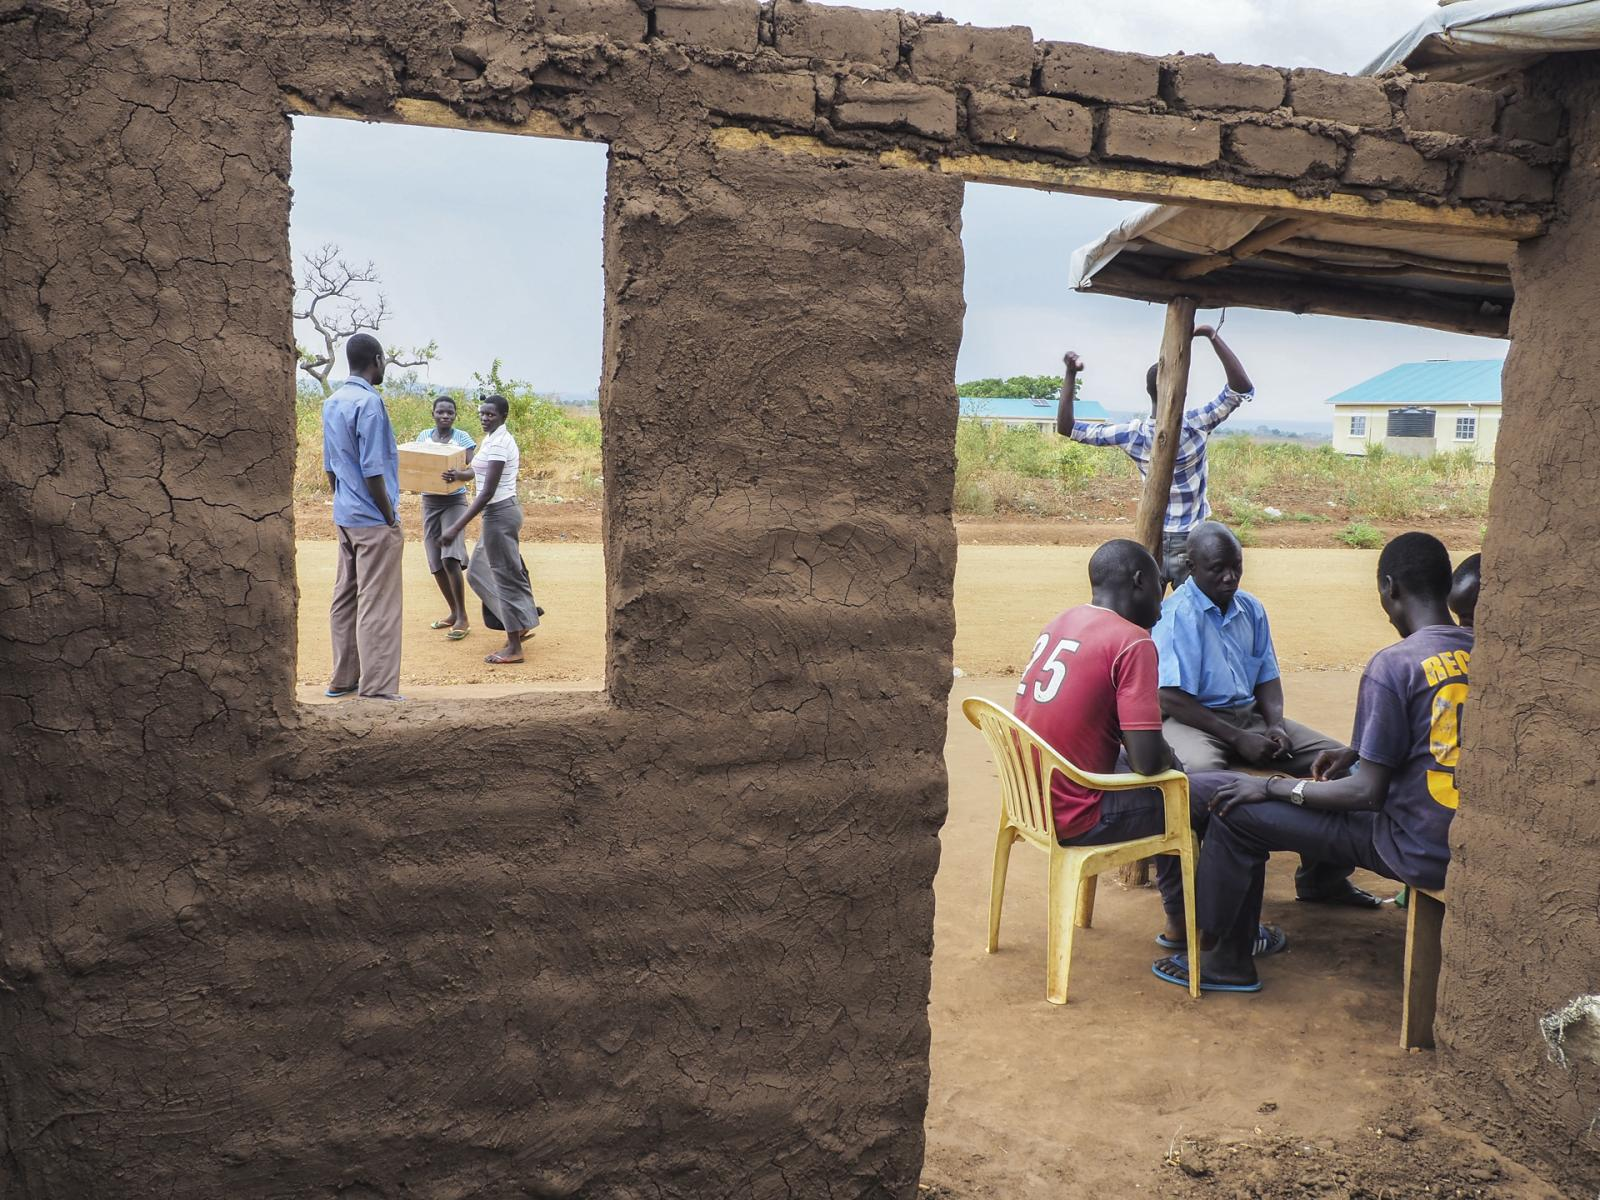 Bidi Bidi Refugee Settlement, Uganda. Joseph Yengatu